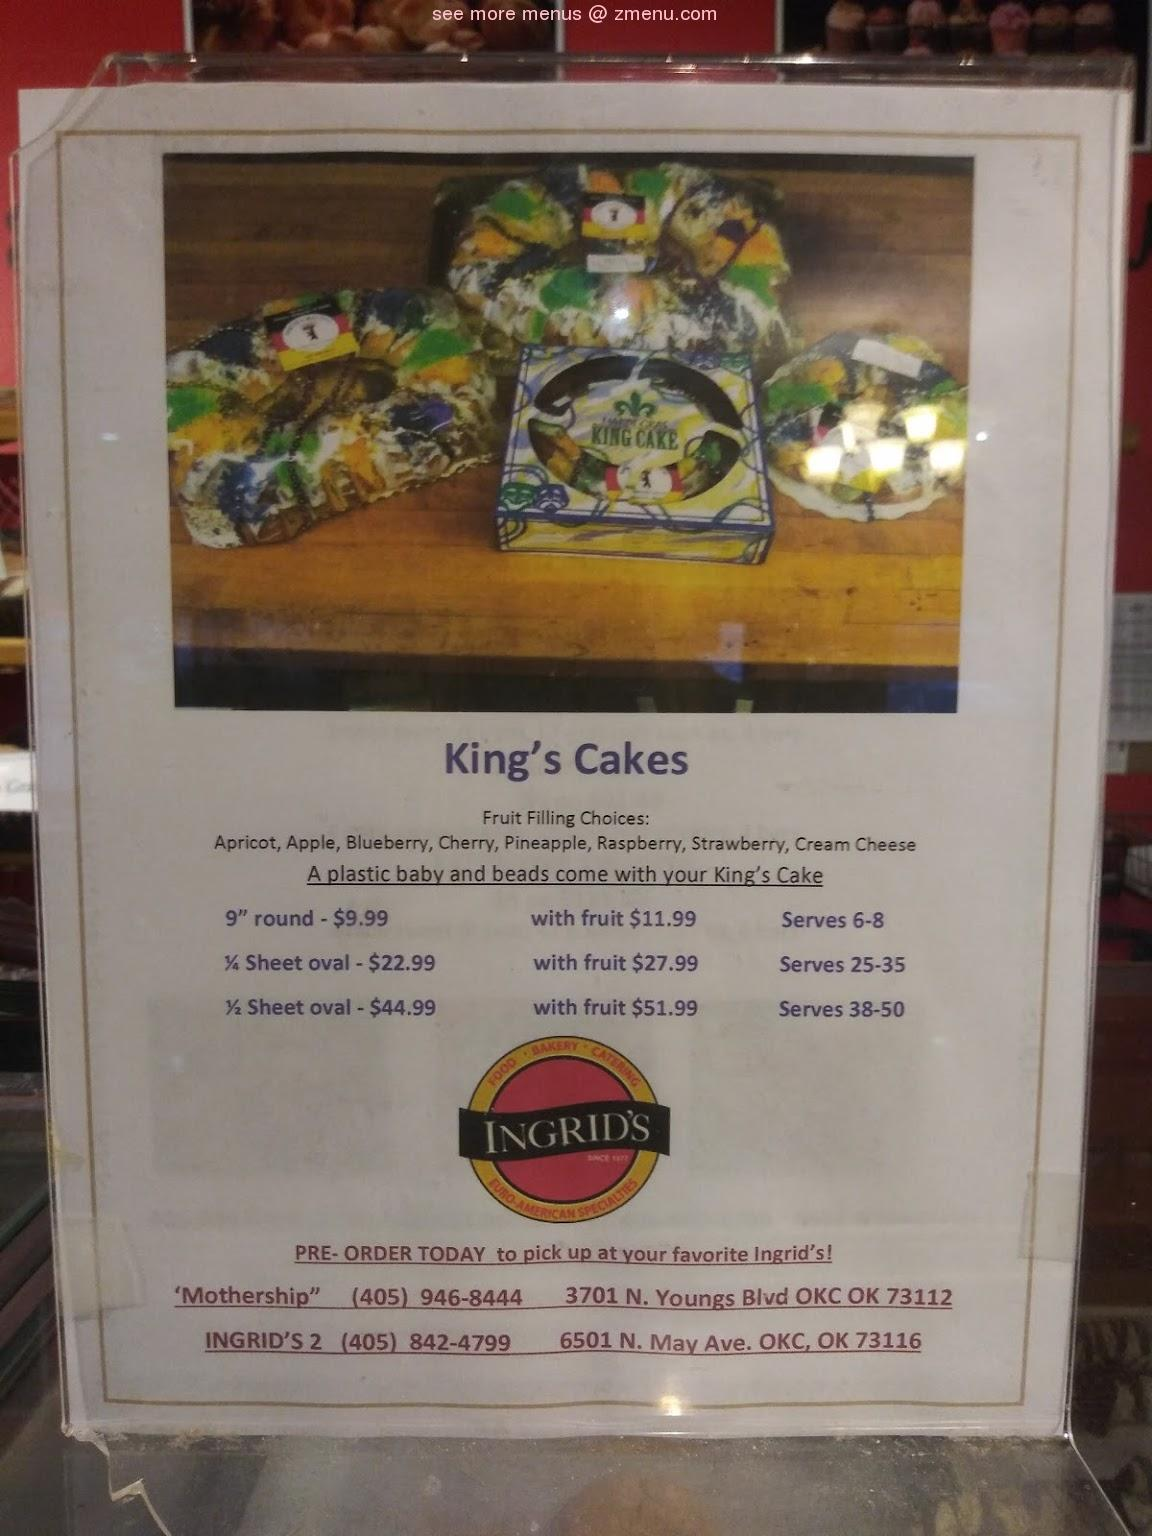 Online Menu Of Ingrids Kitchen Restaurant Oklahoma City Oklahoma 73112 Zmenu